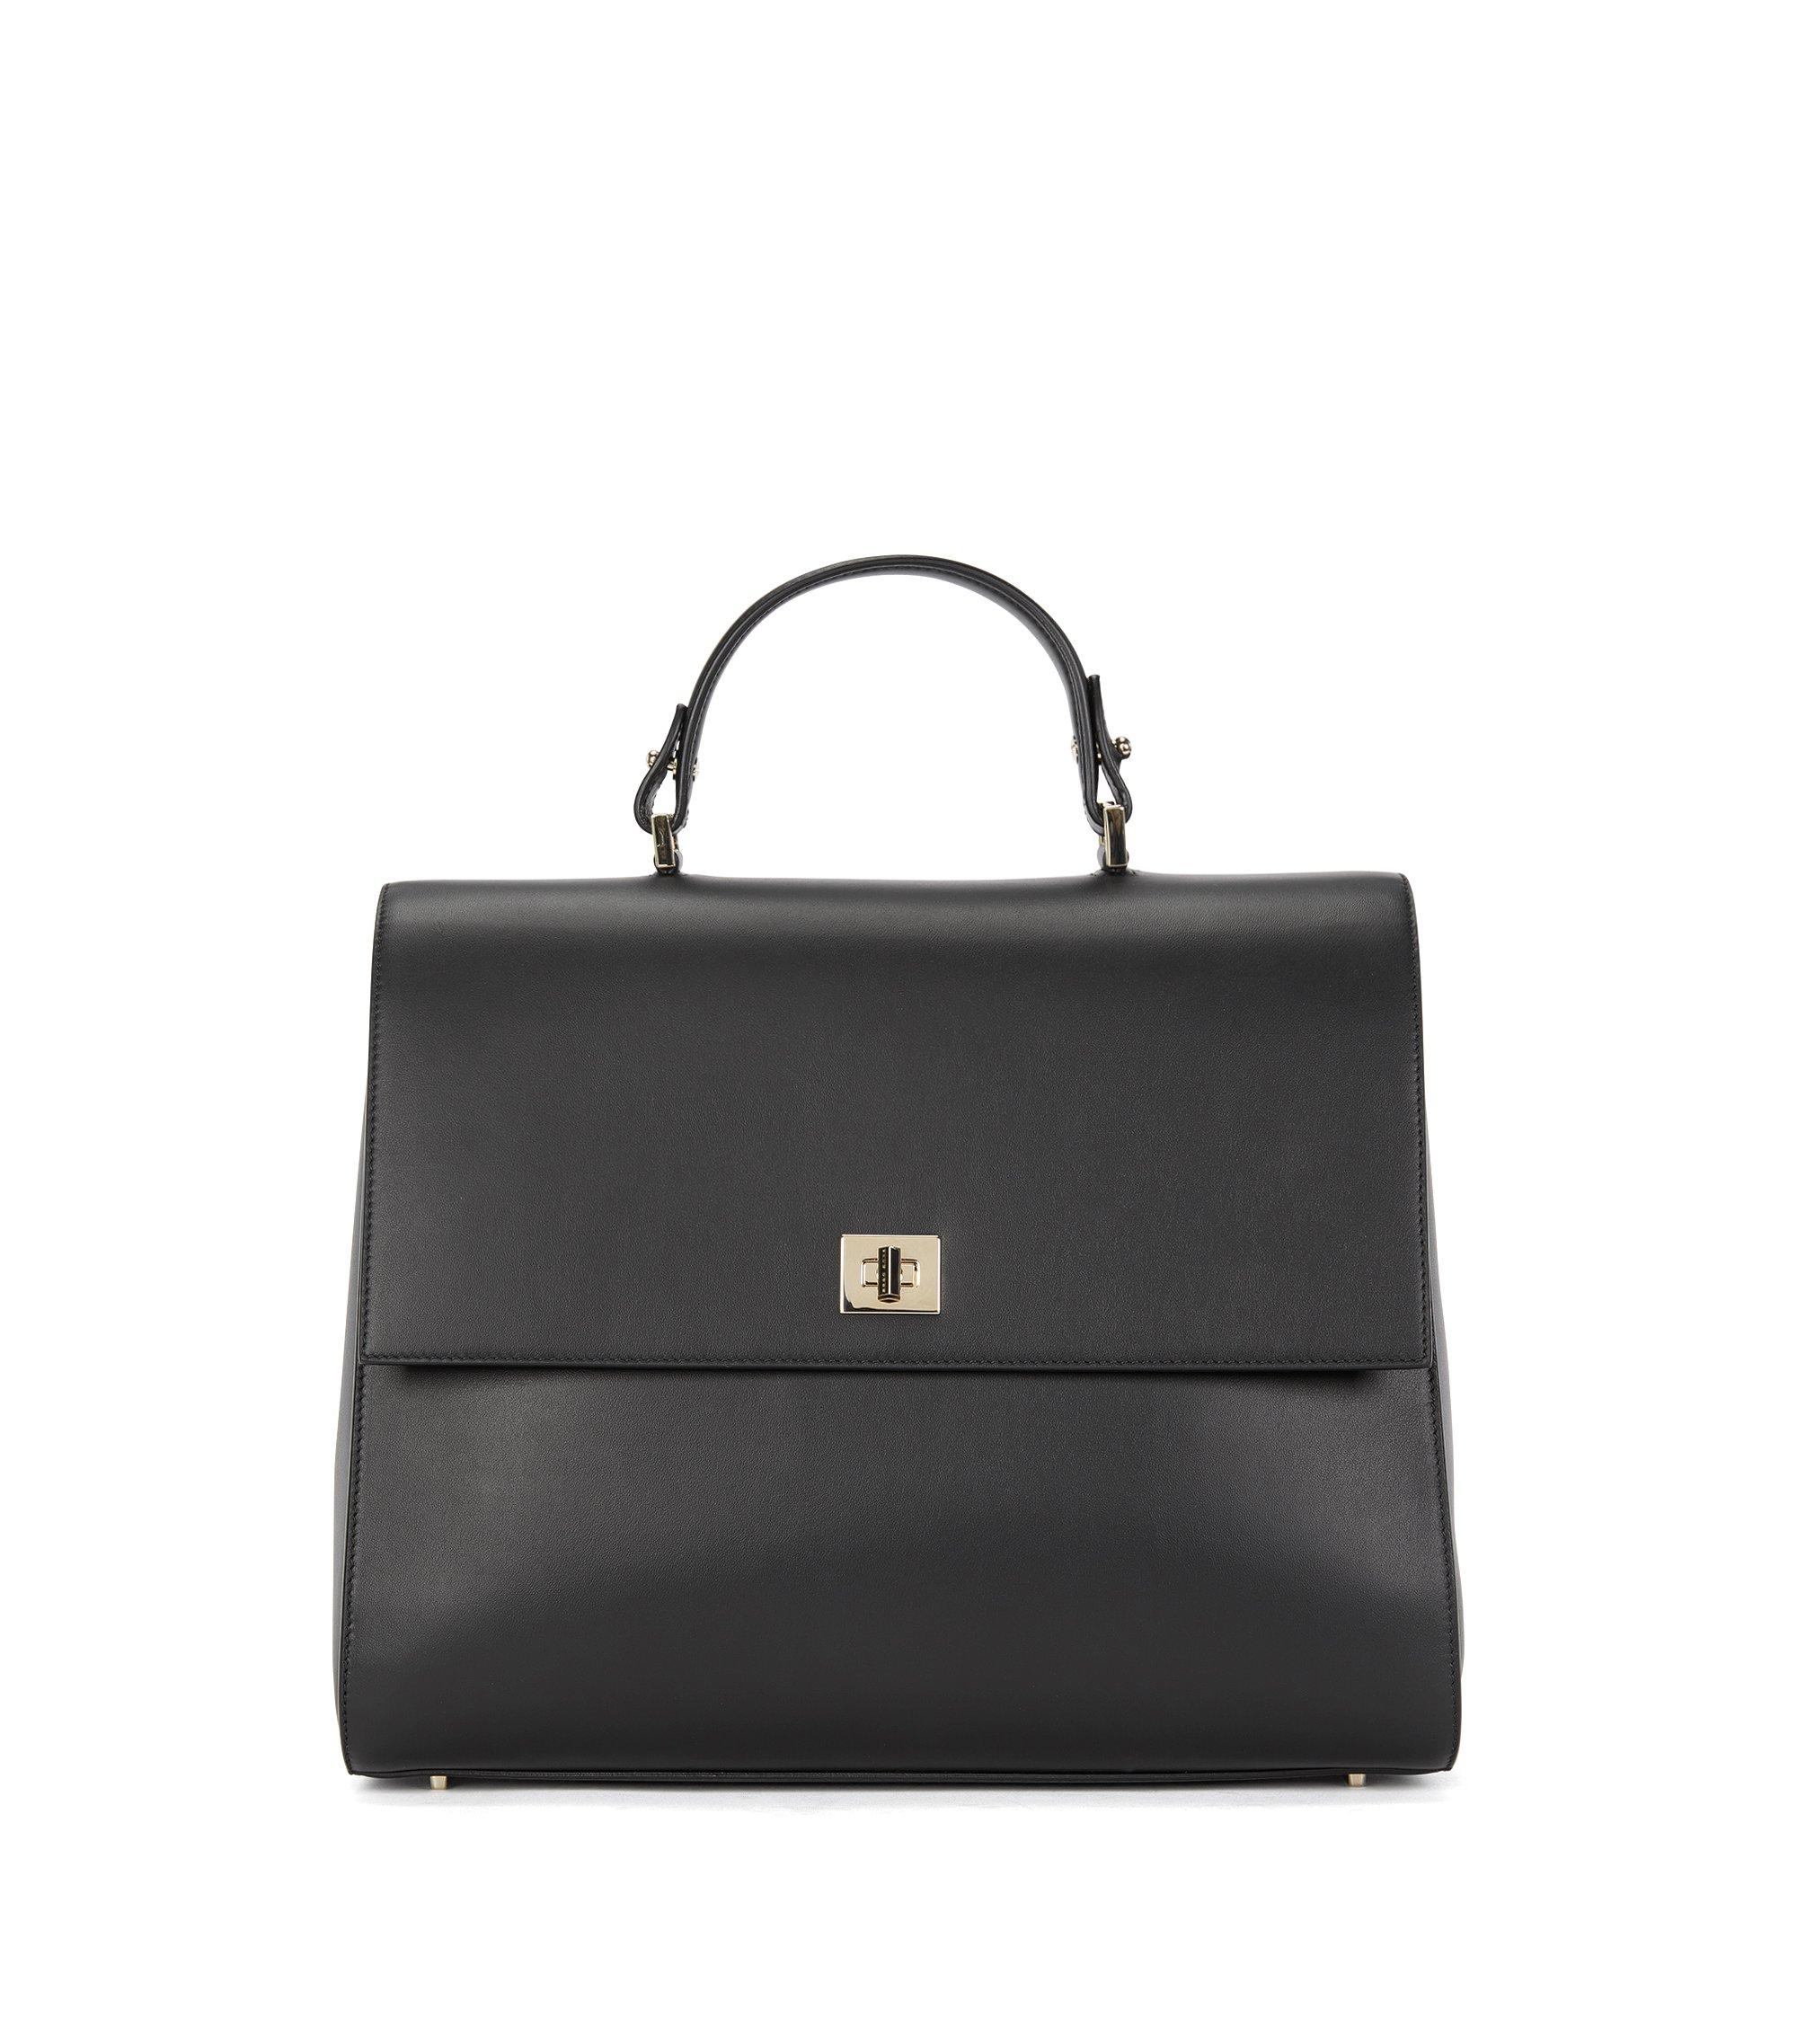 BOSS Bespoke Handtasche aus glattem Leder, Schwarz